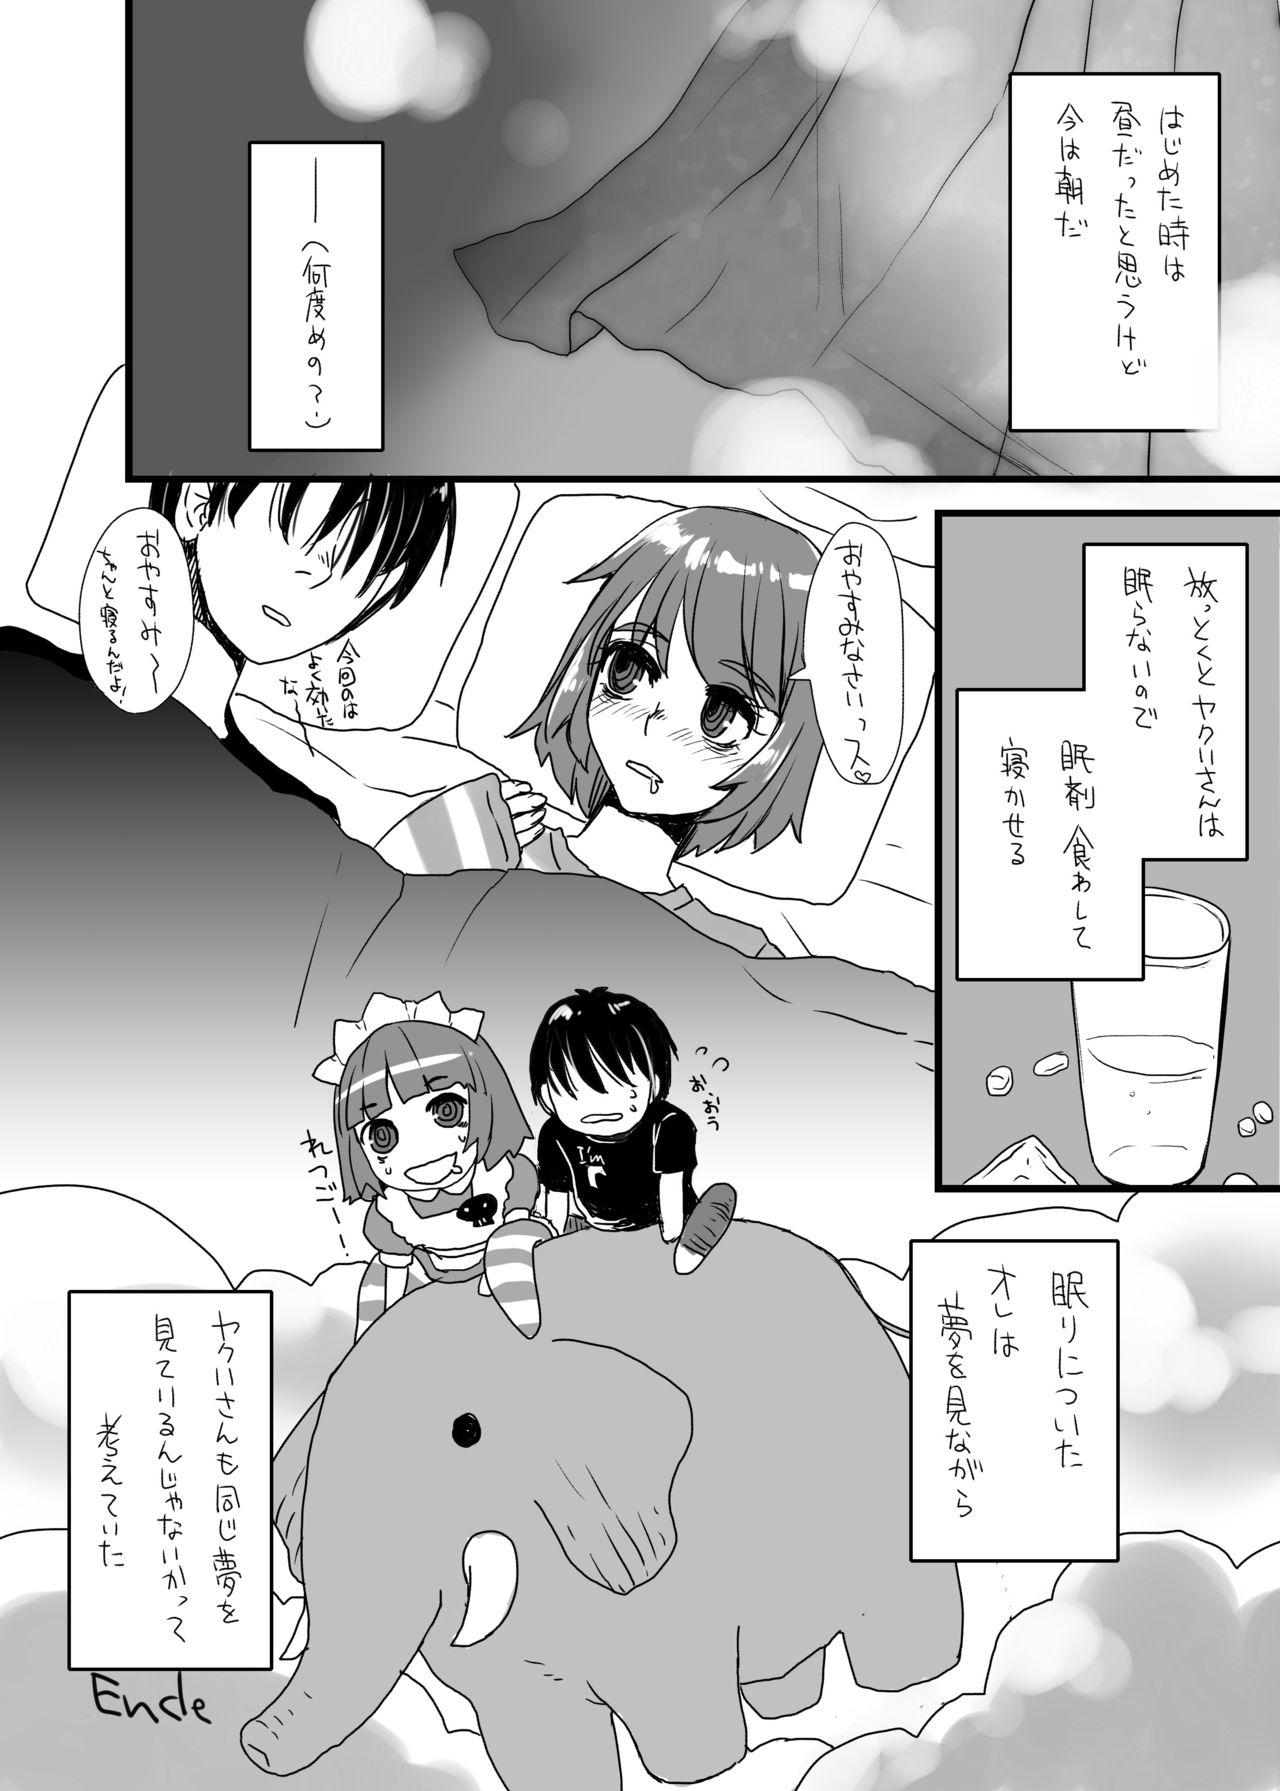 [Sarurururu (Doru Riheko)] Yakui-san Ero  Soushuuhen 2013-2016 (Nijiura Maids) [Digital] 30